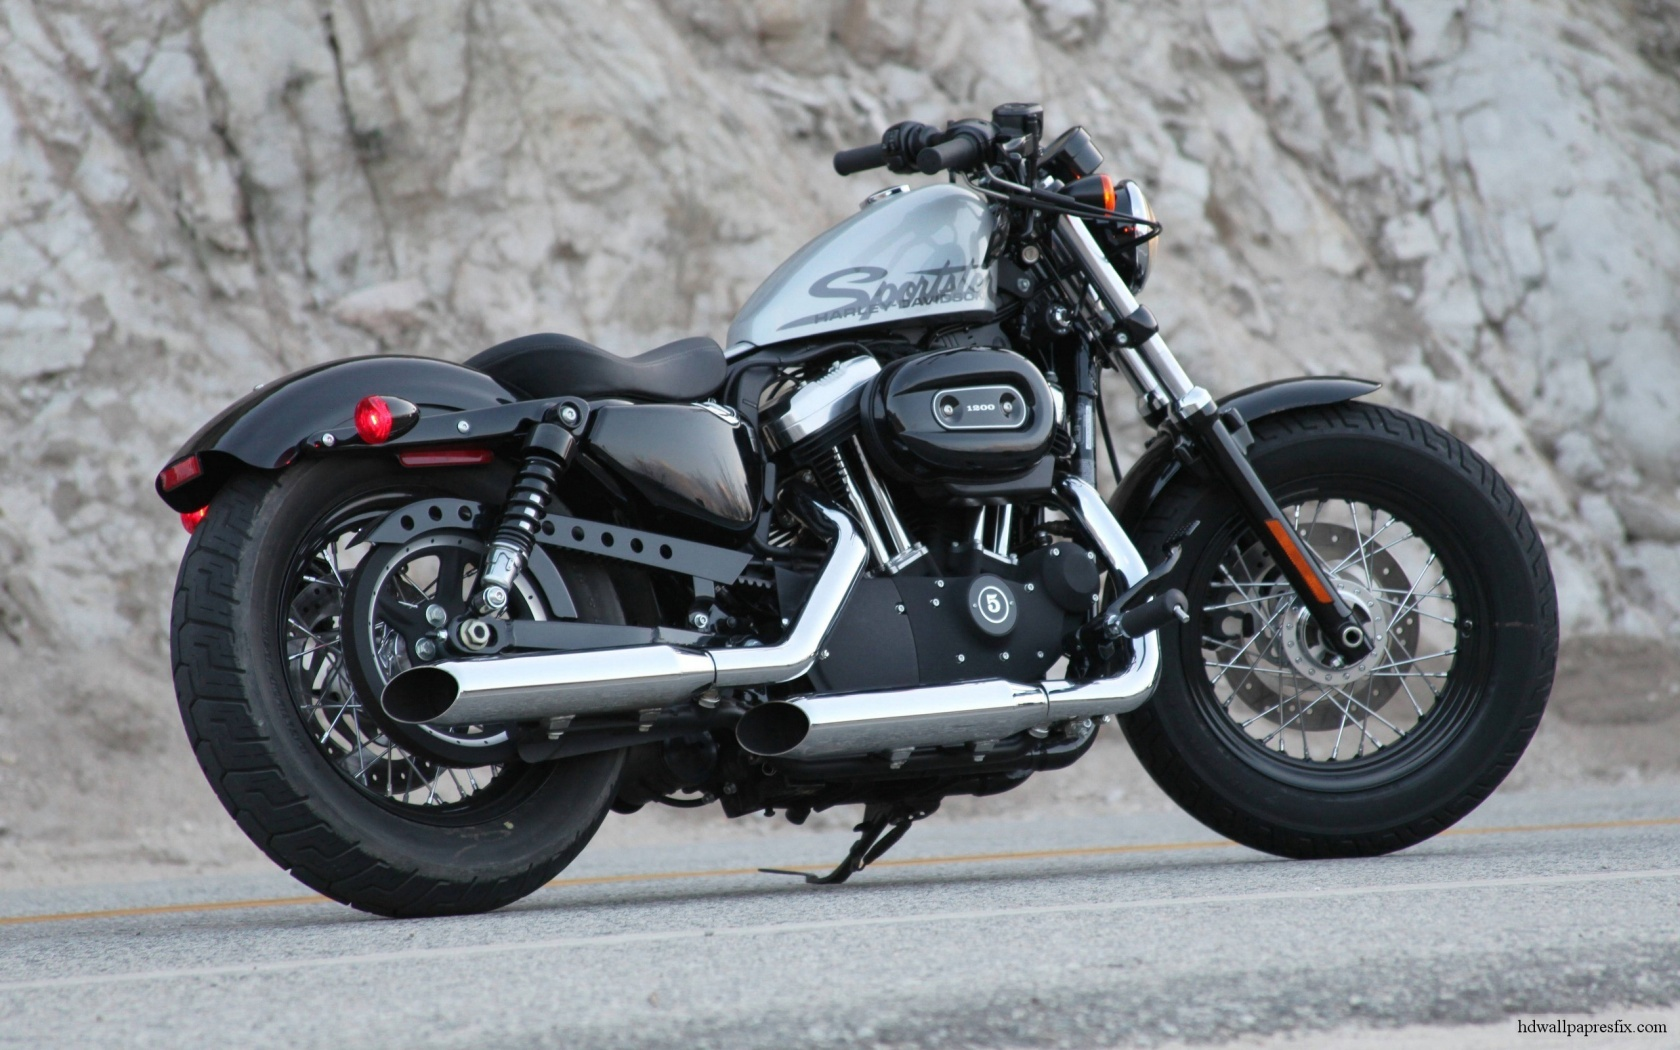 Harley Davidson Wallpapers Motorcycle 1680x1050